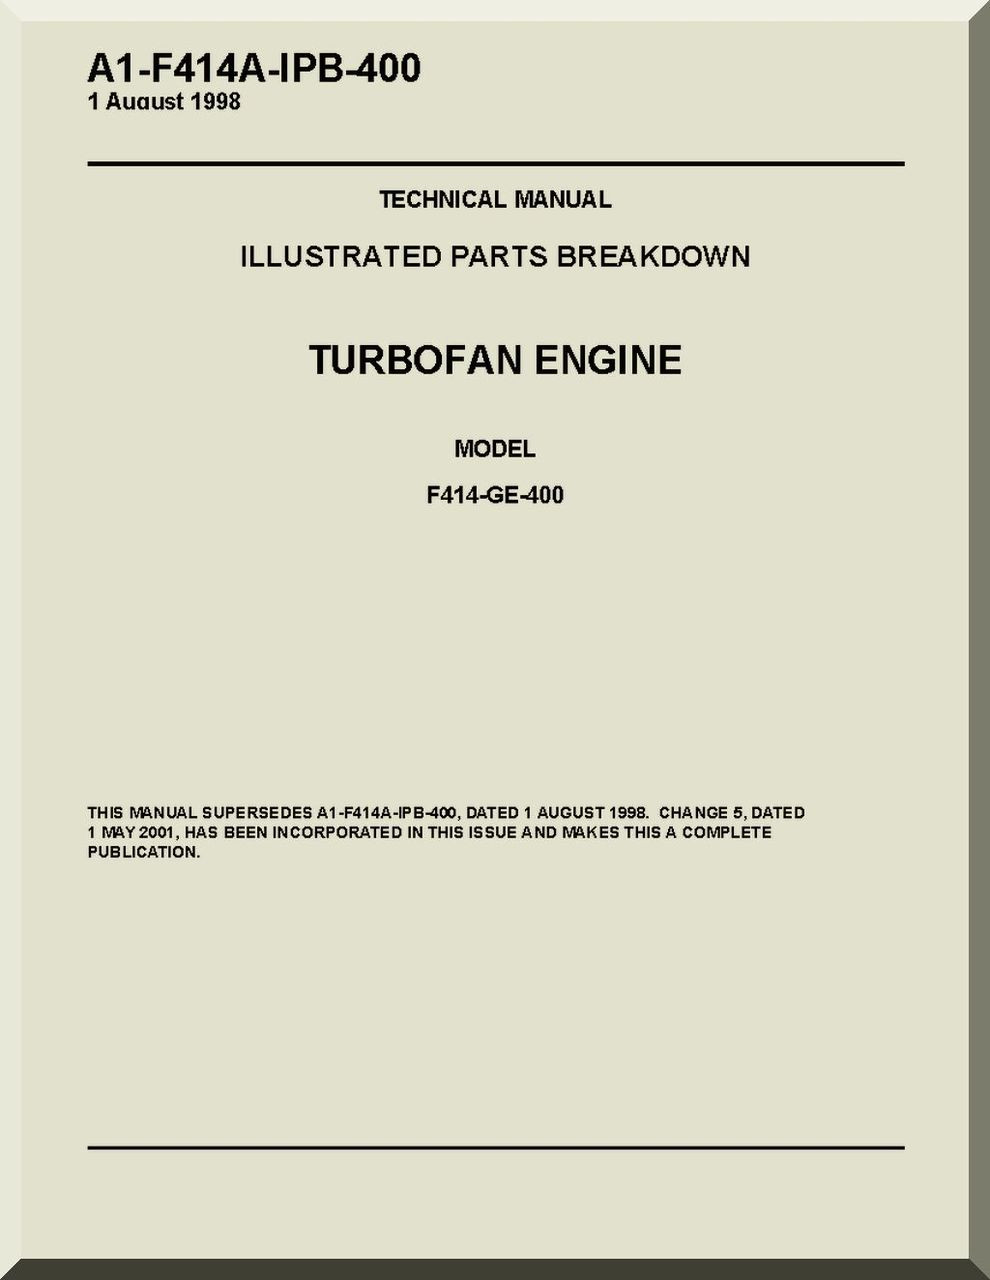 F414 Ge 400 Turbofan Engine Images Of Home Design Diagram General Electric